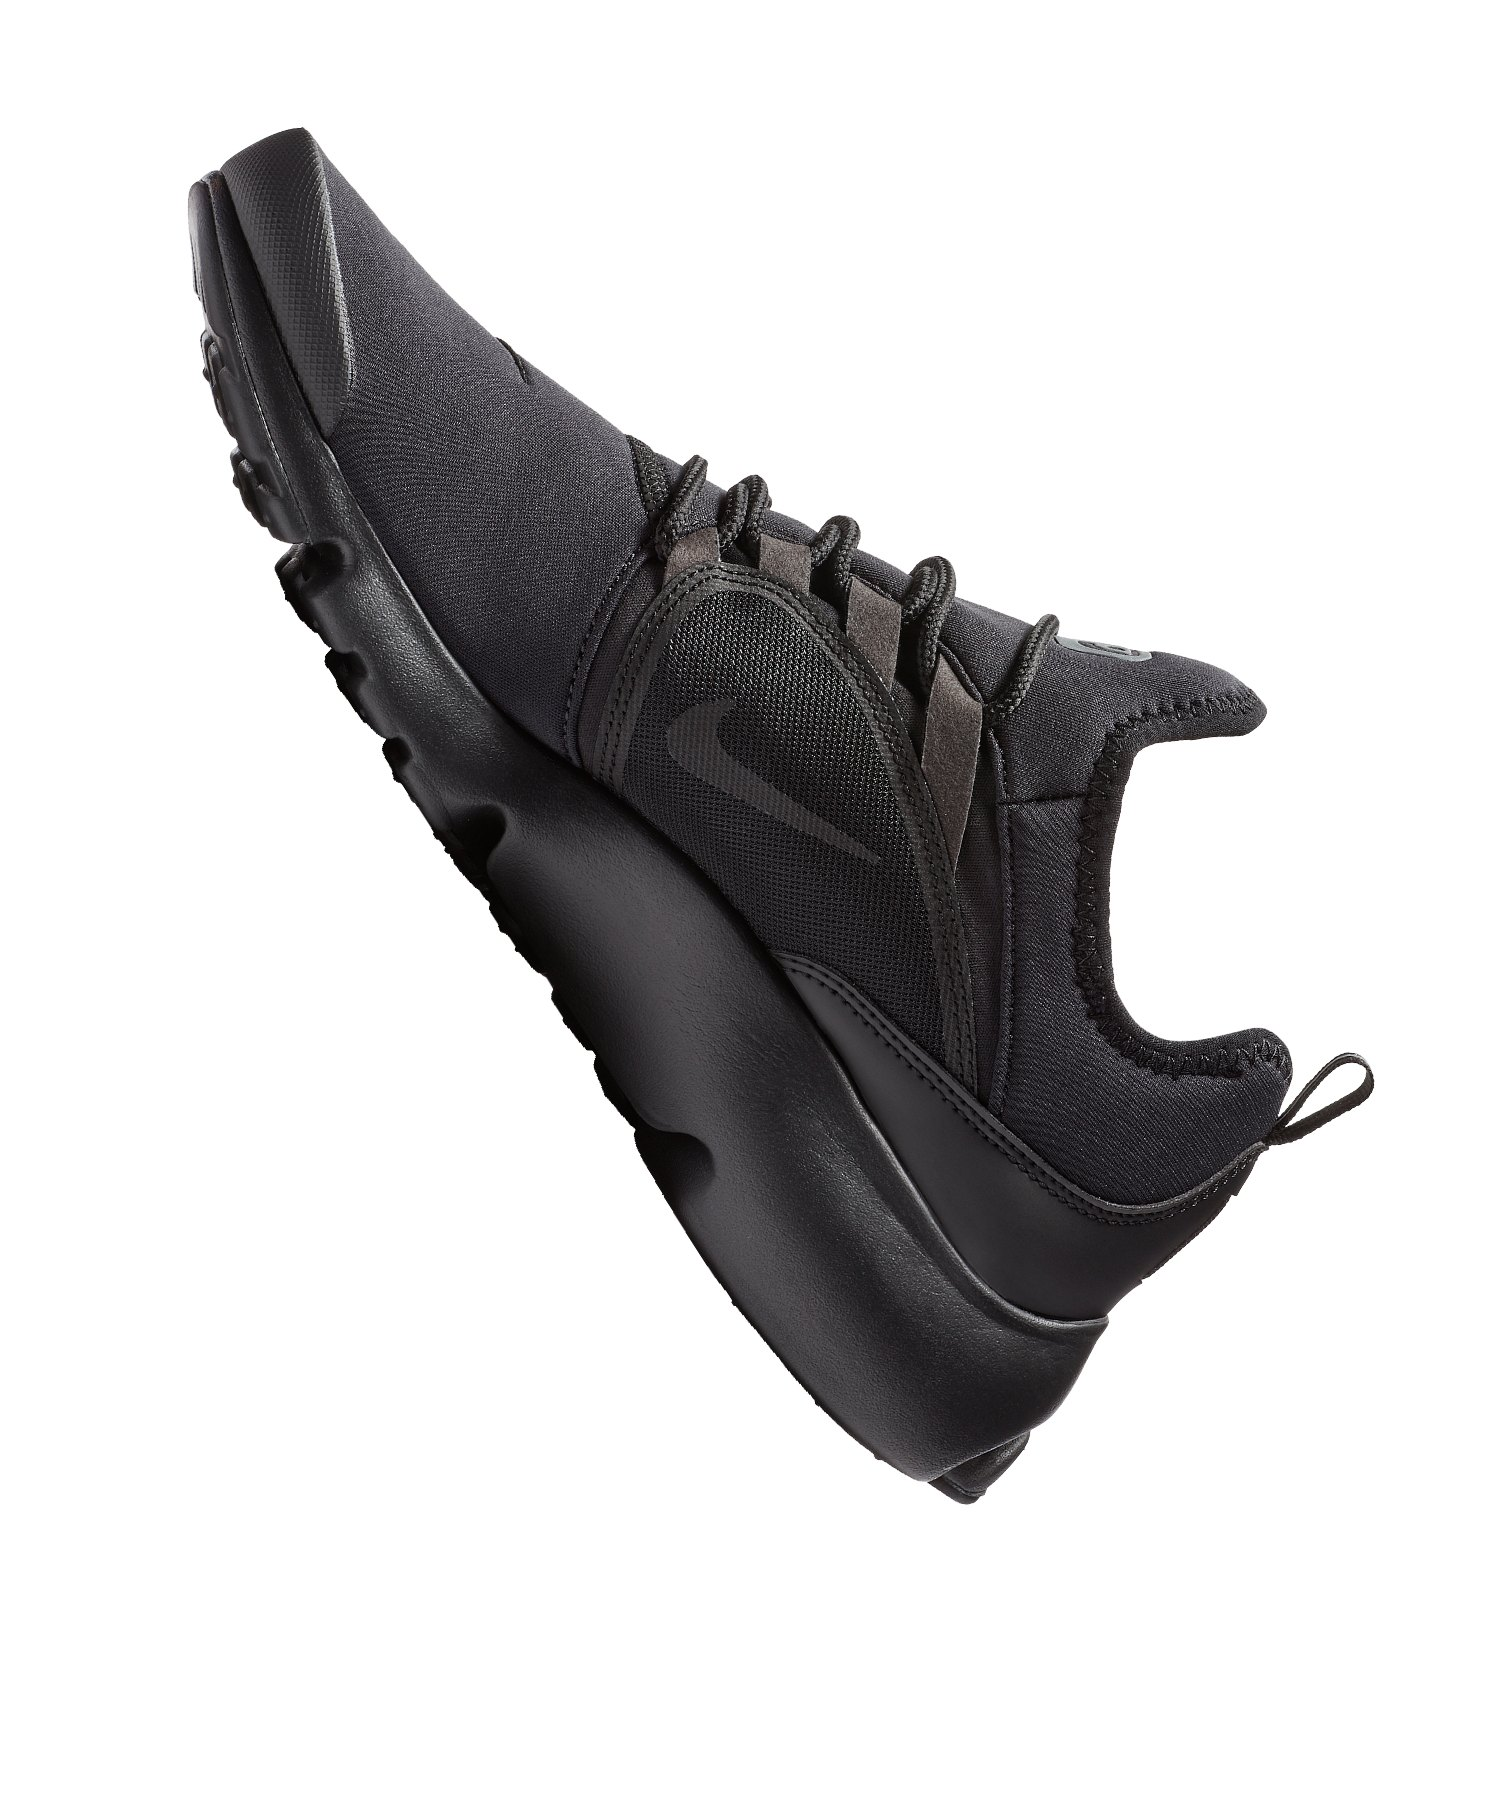 0a0b50c290781 ... Nike Presto Fly World Sneaker Schwarz F003 - schwarz ...